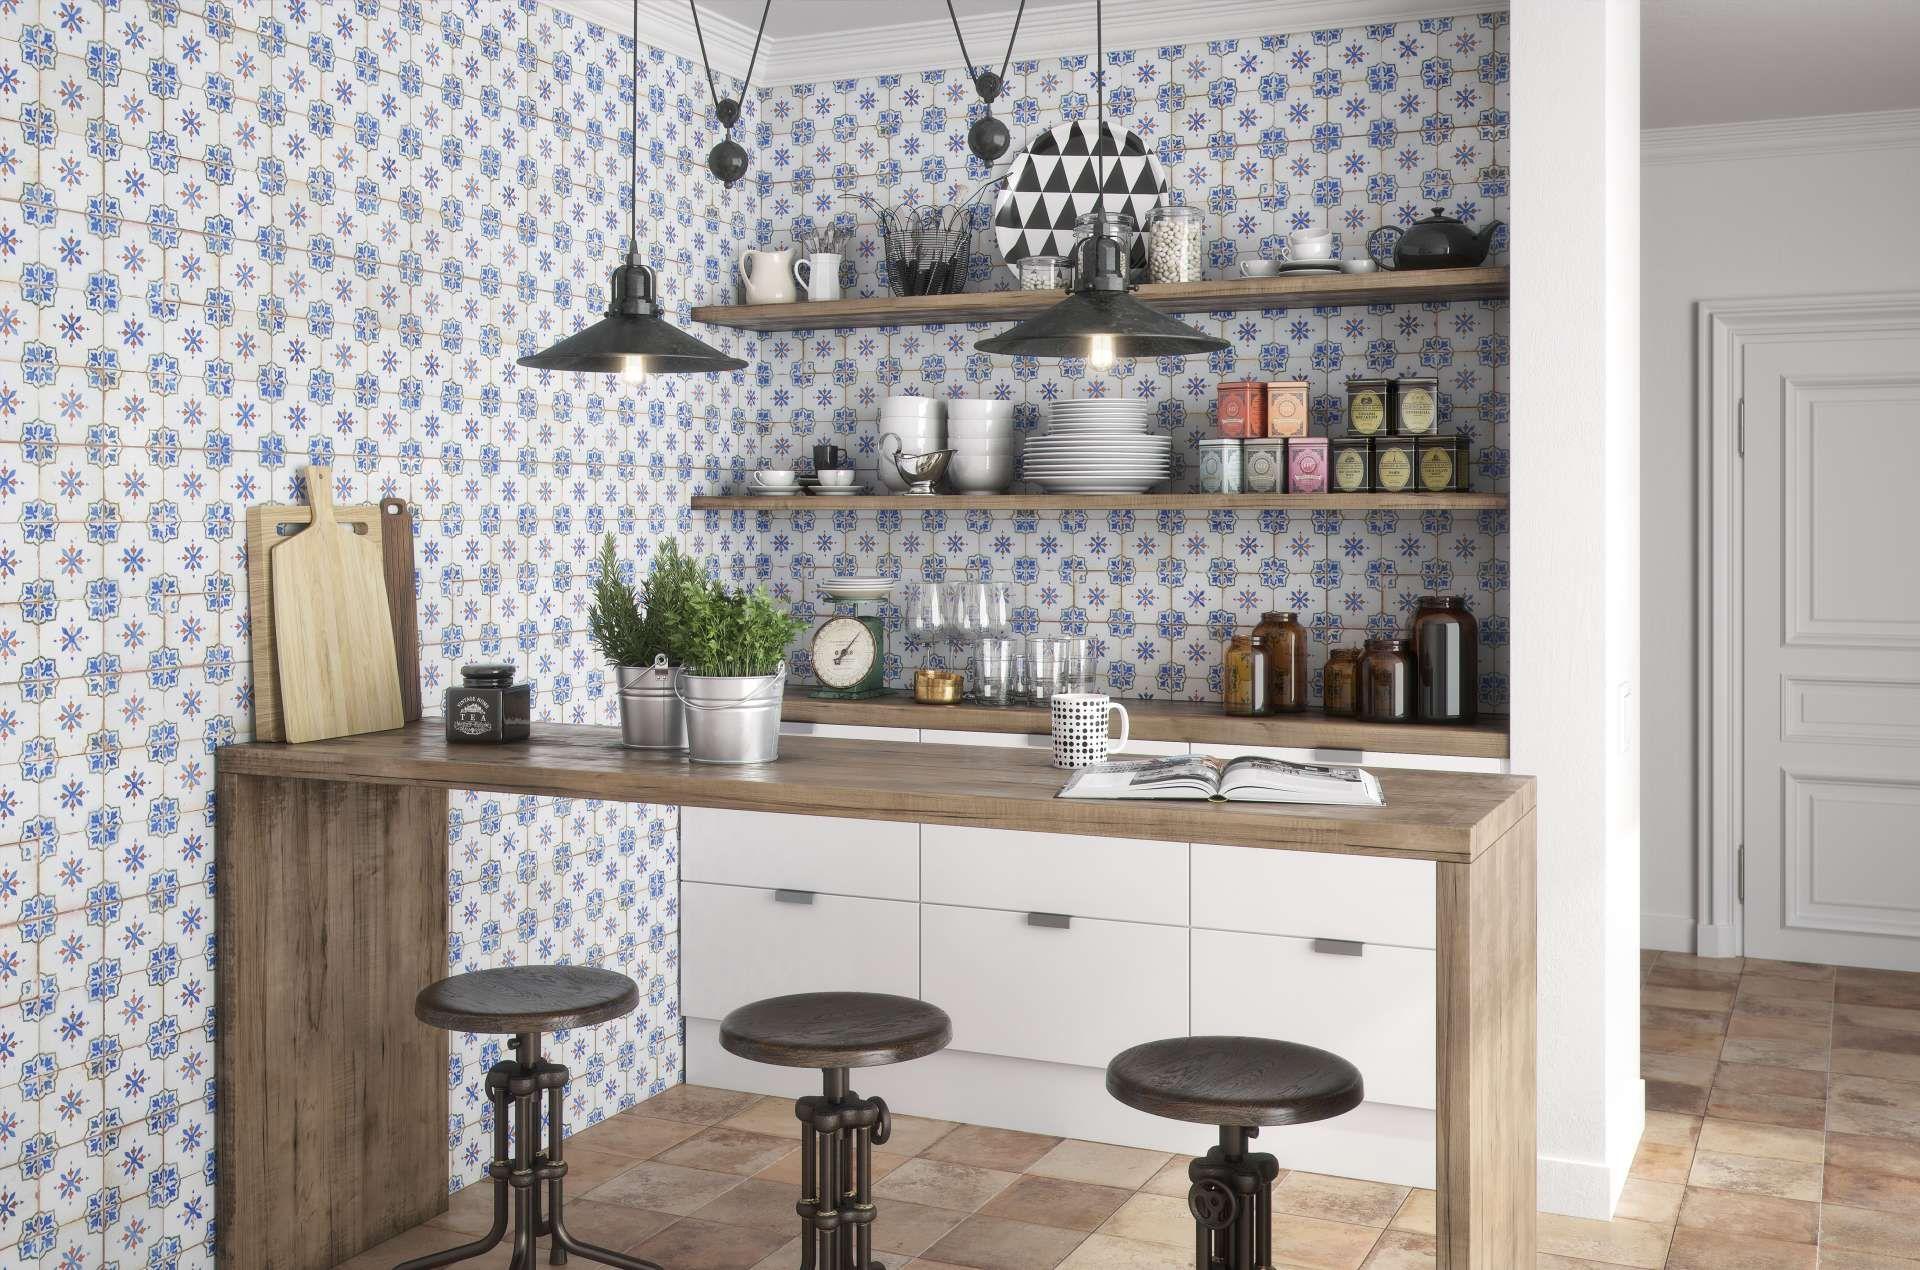 Kitchen Tiles Online Peronda Fs Mirambel A 33x33 Kakel Online Tiles R Us Ab Home